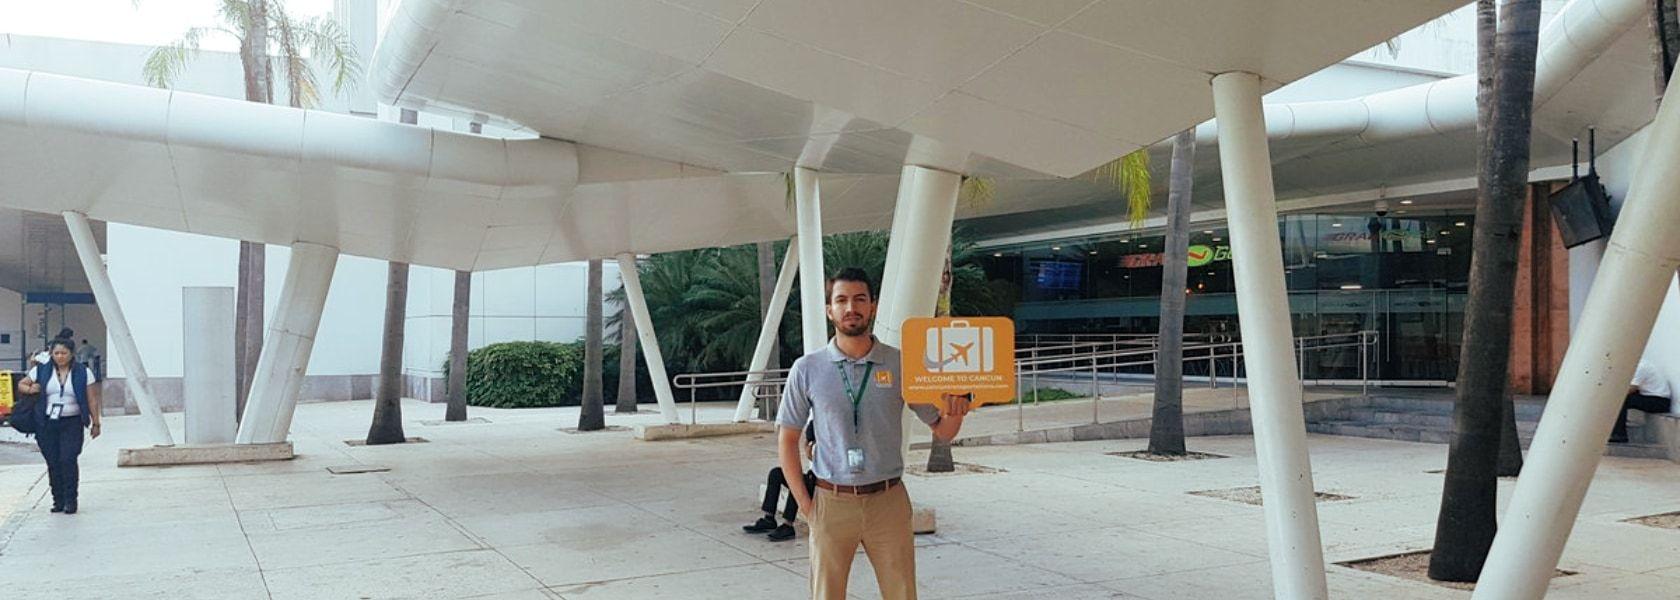 Такси в аэропорту Канкуна